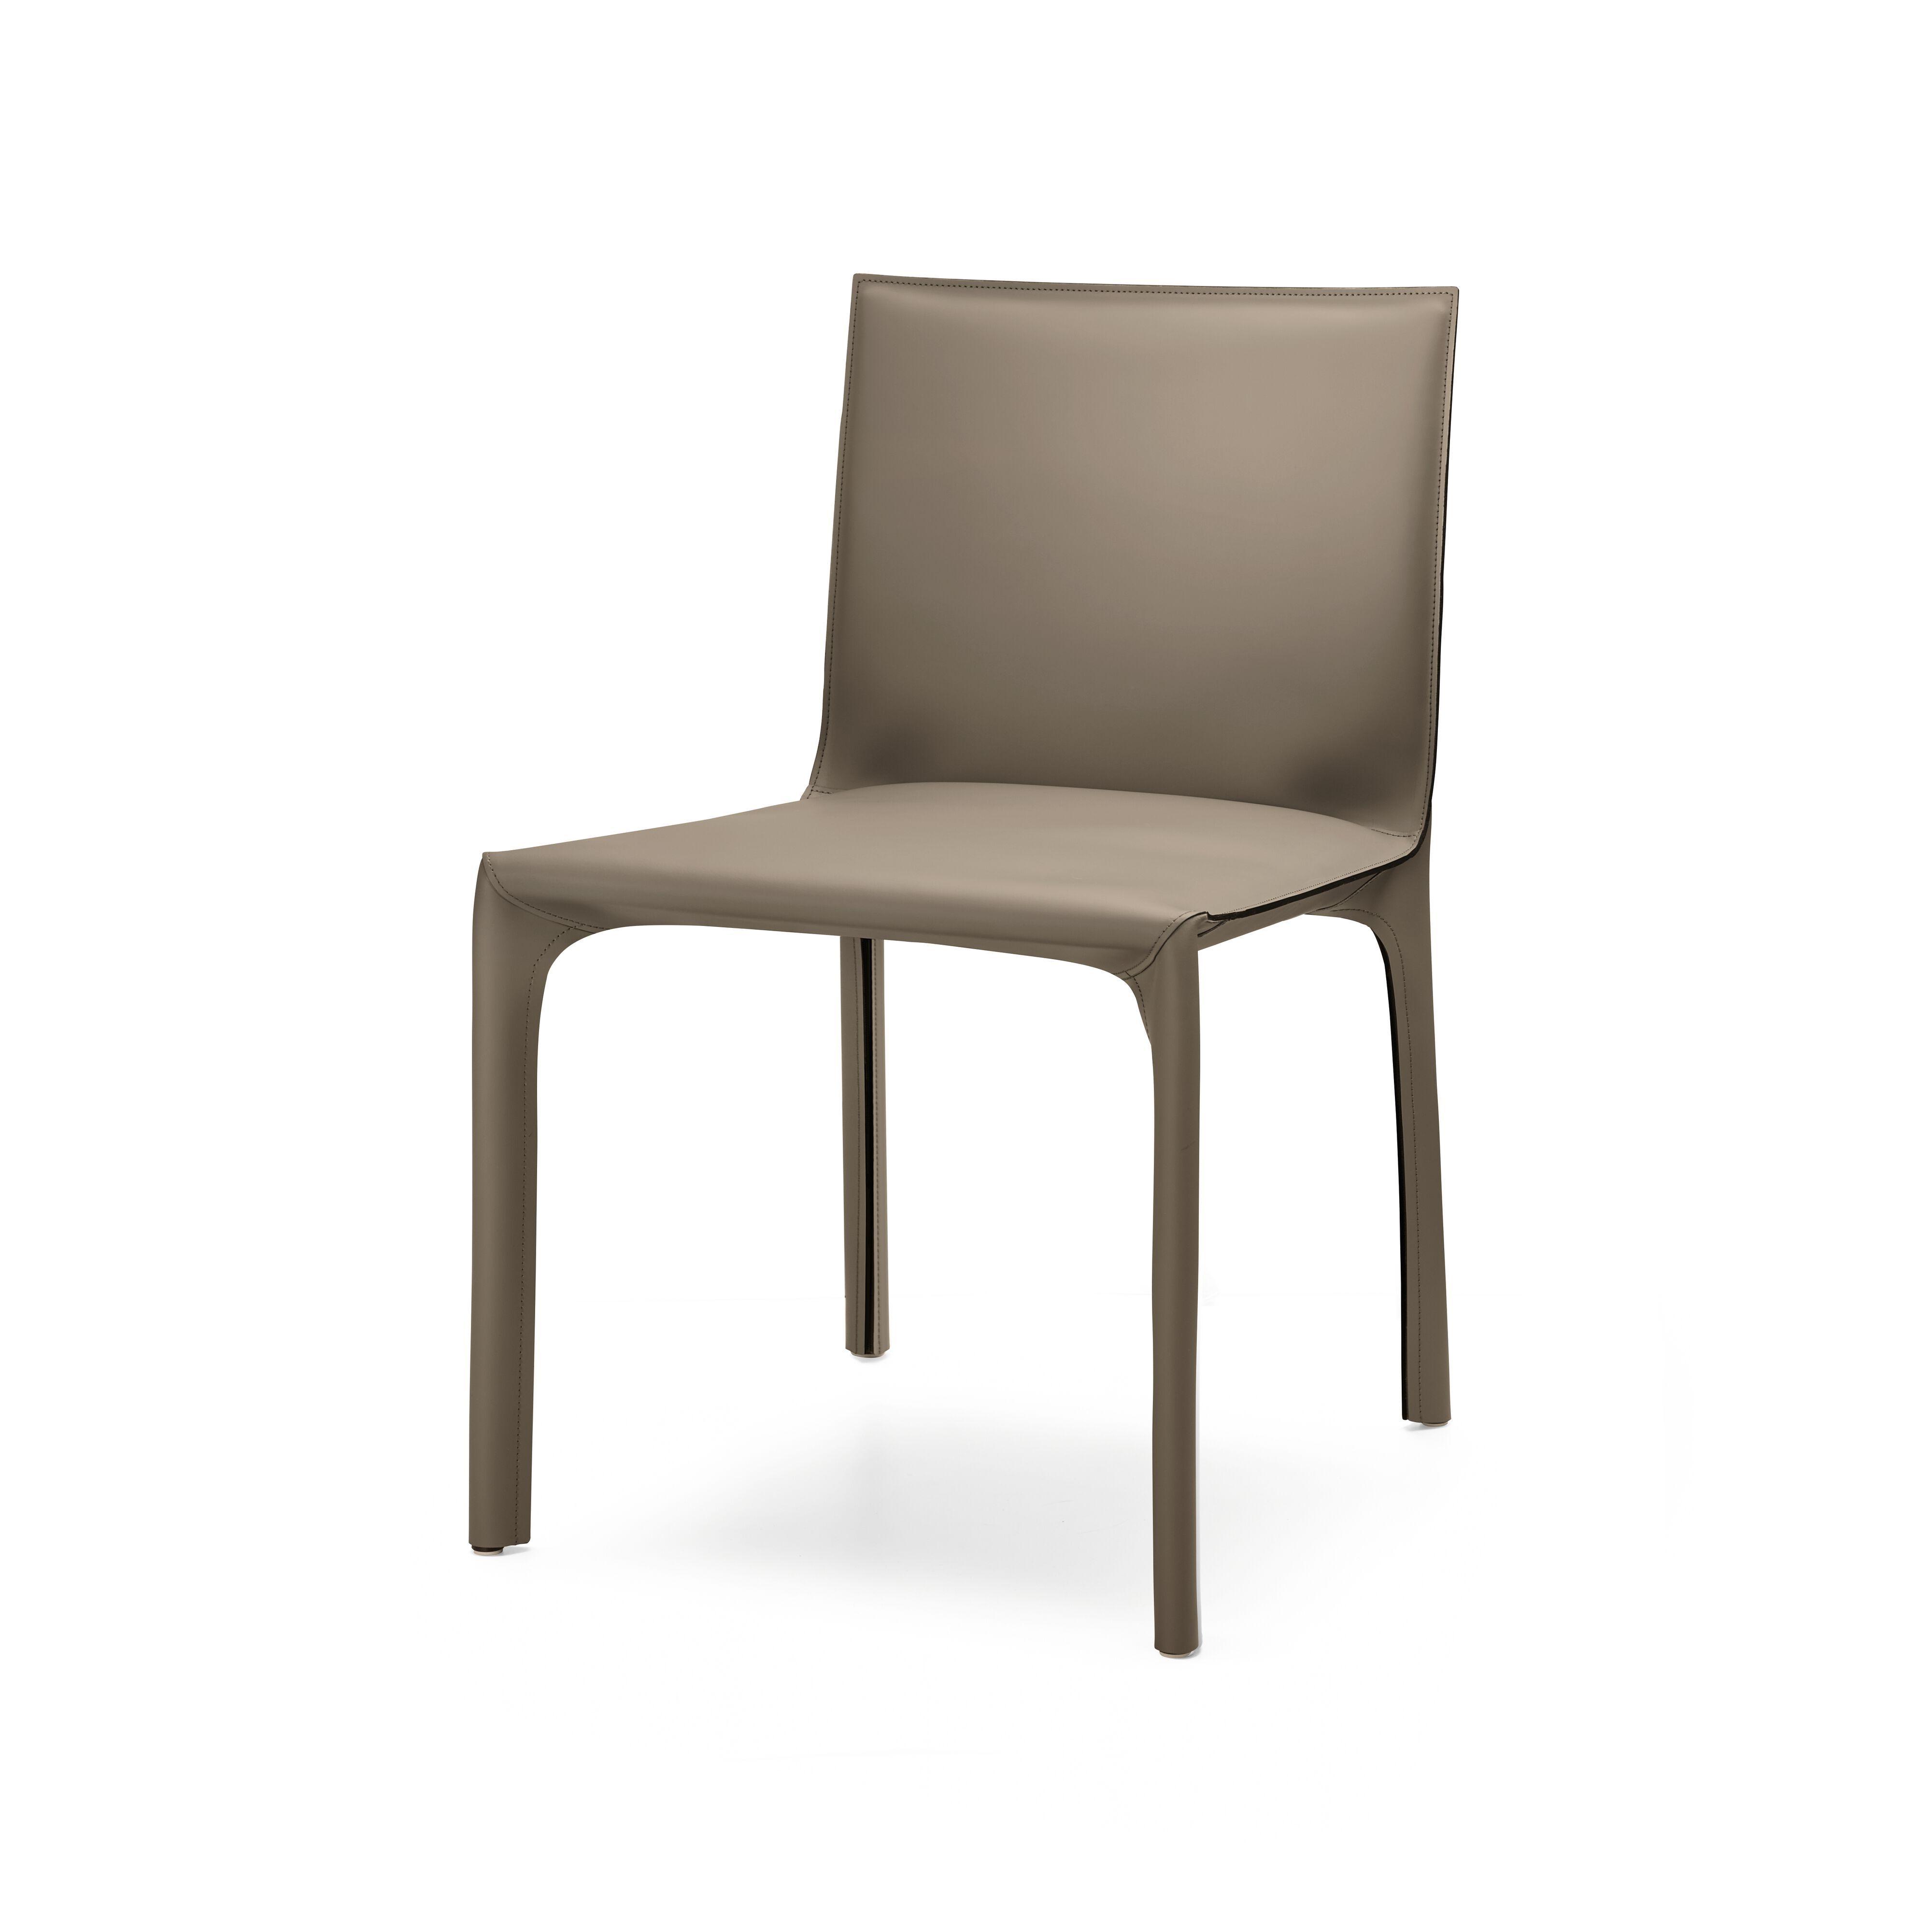 01-WK-Saddle-Chair-0007.tif